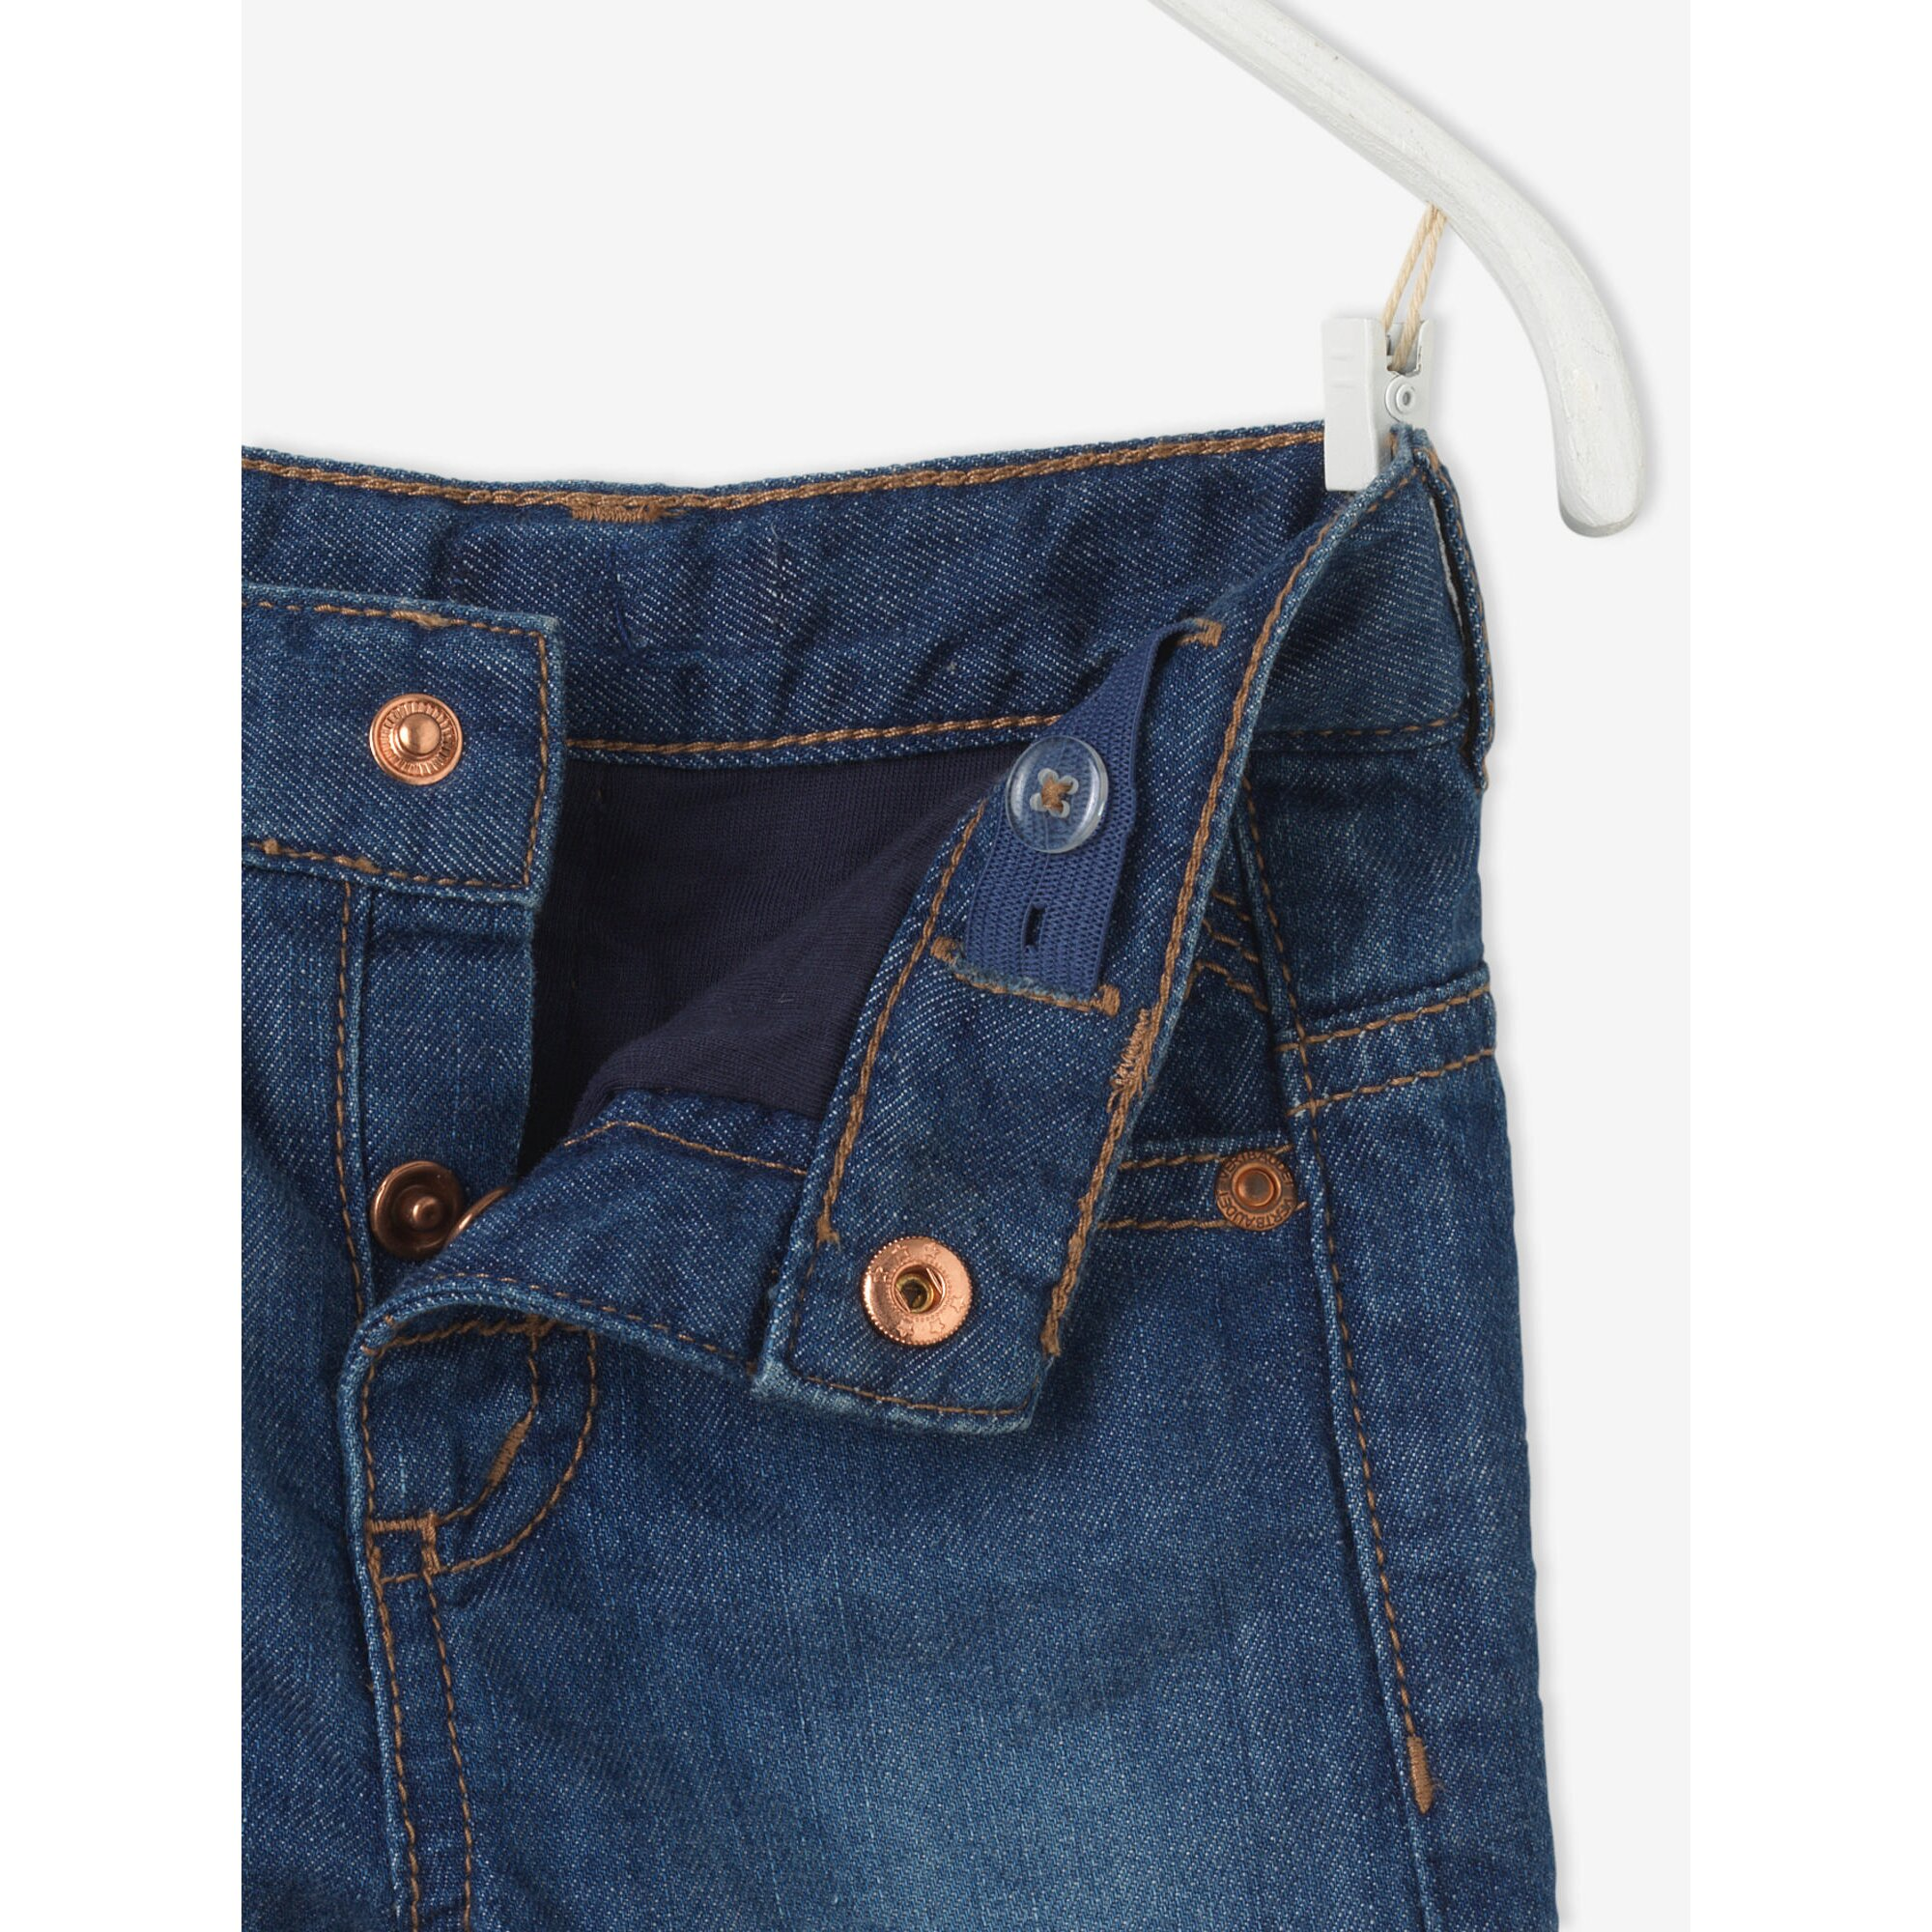 vertbaudet-gefutterte-jeans-fur-baby-jungen, 18.99 EUR @ babywalz-de